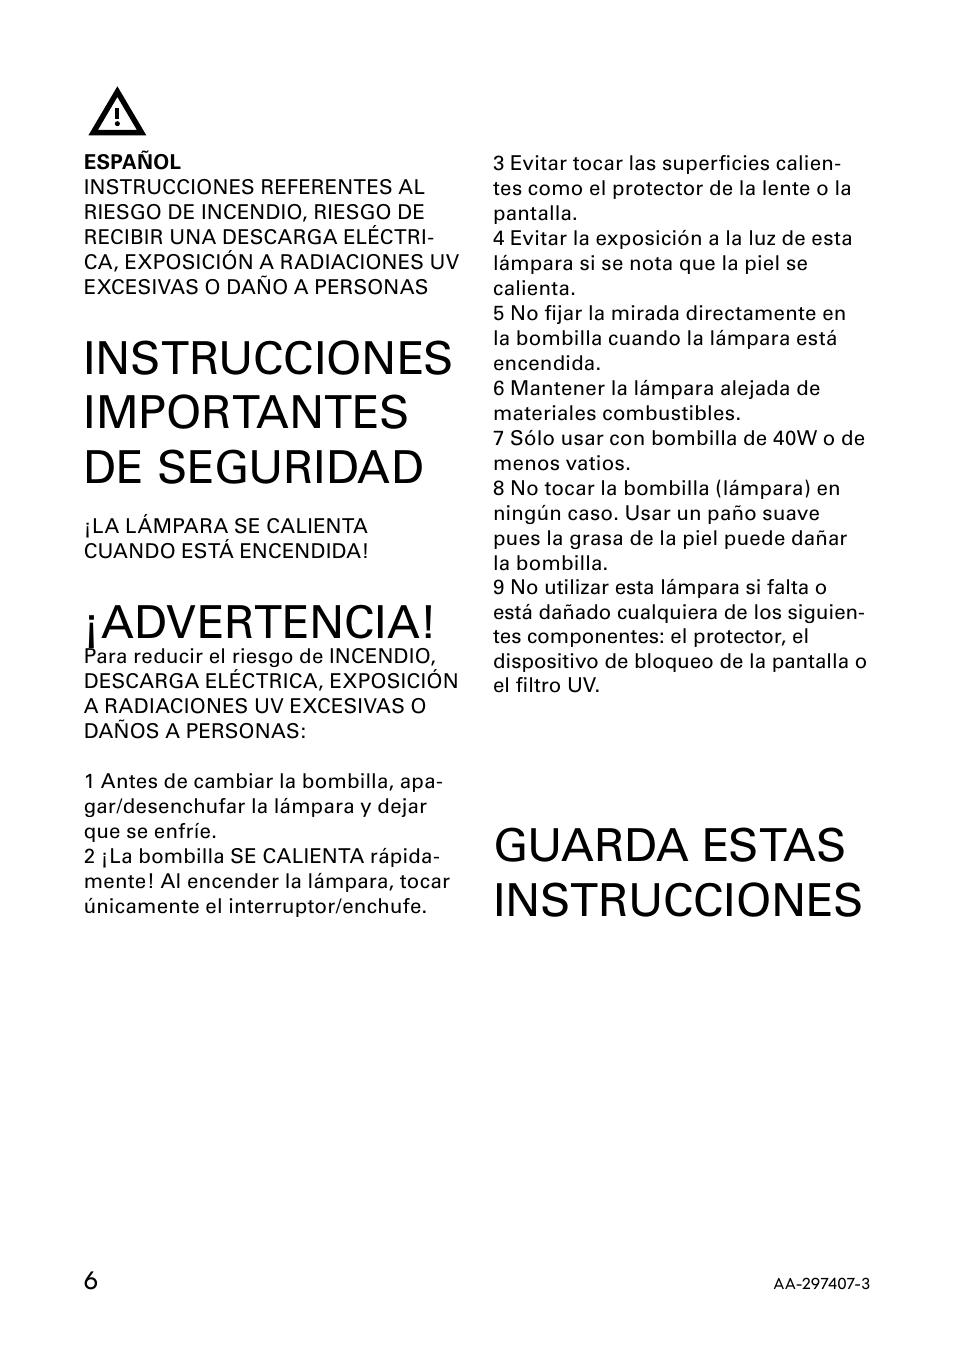 de importantes estas Guarda estas instruccionesInstrucciones de estas instruccionesInstrucciones instruccionesInstrucciones importantes Guarda Guarda O0w8PkXn